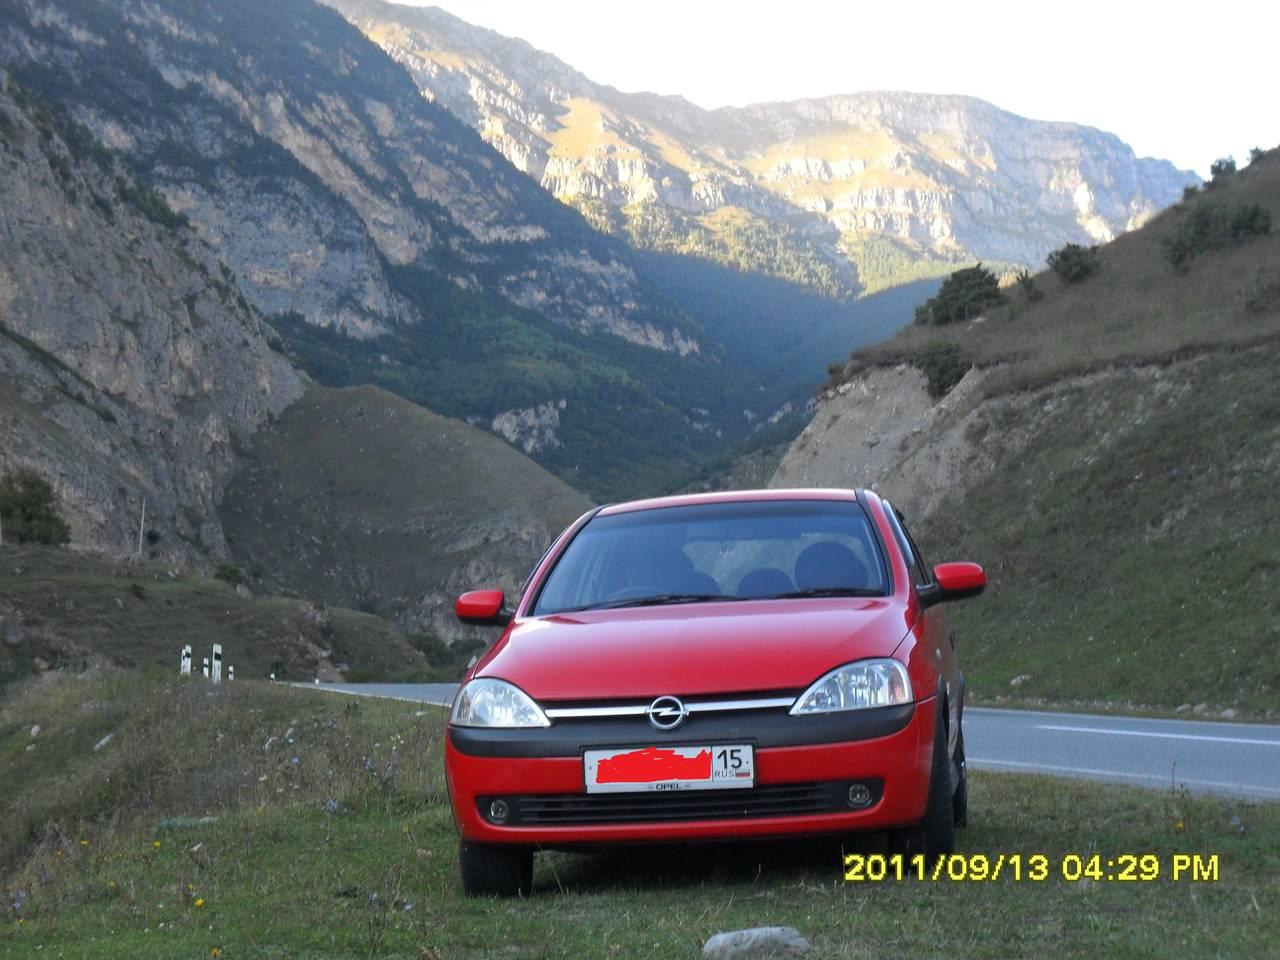 руководство по ремонту автомобиля опель-корса 2010г